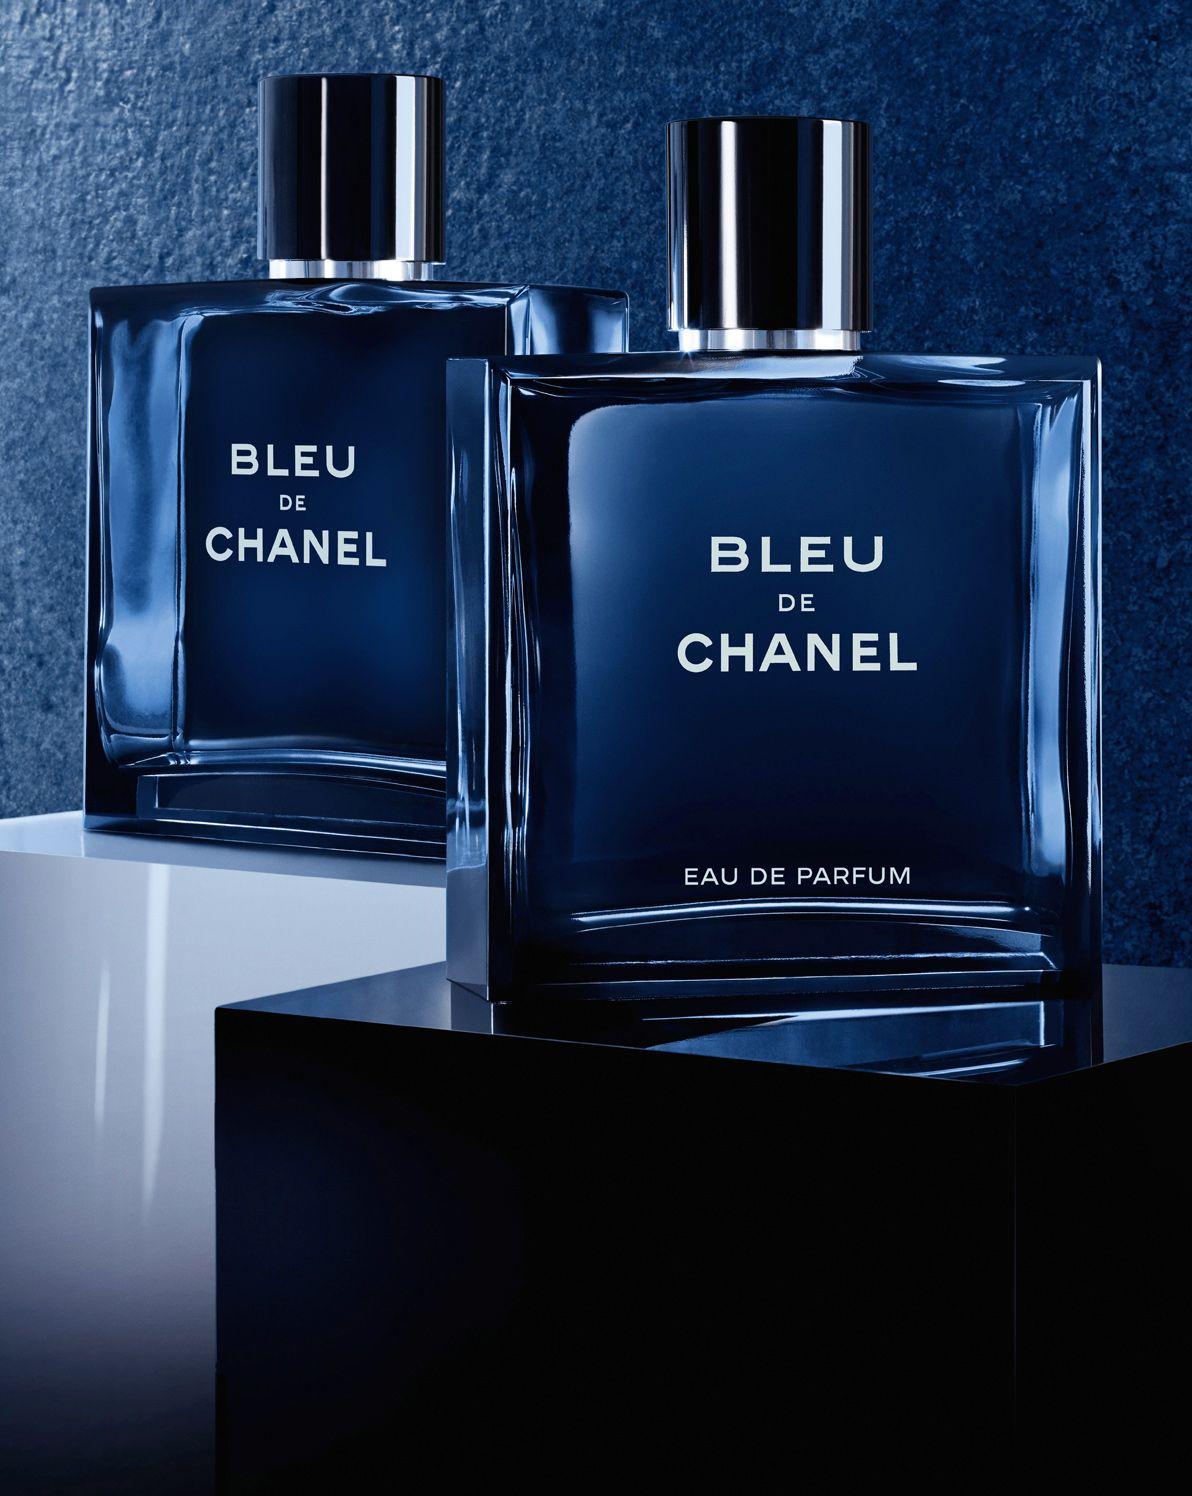 Bleu de Chanel EDP.jpg